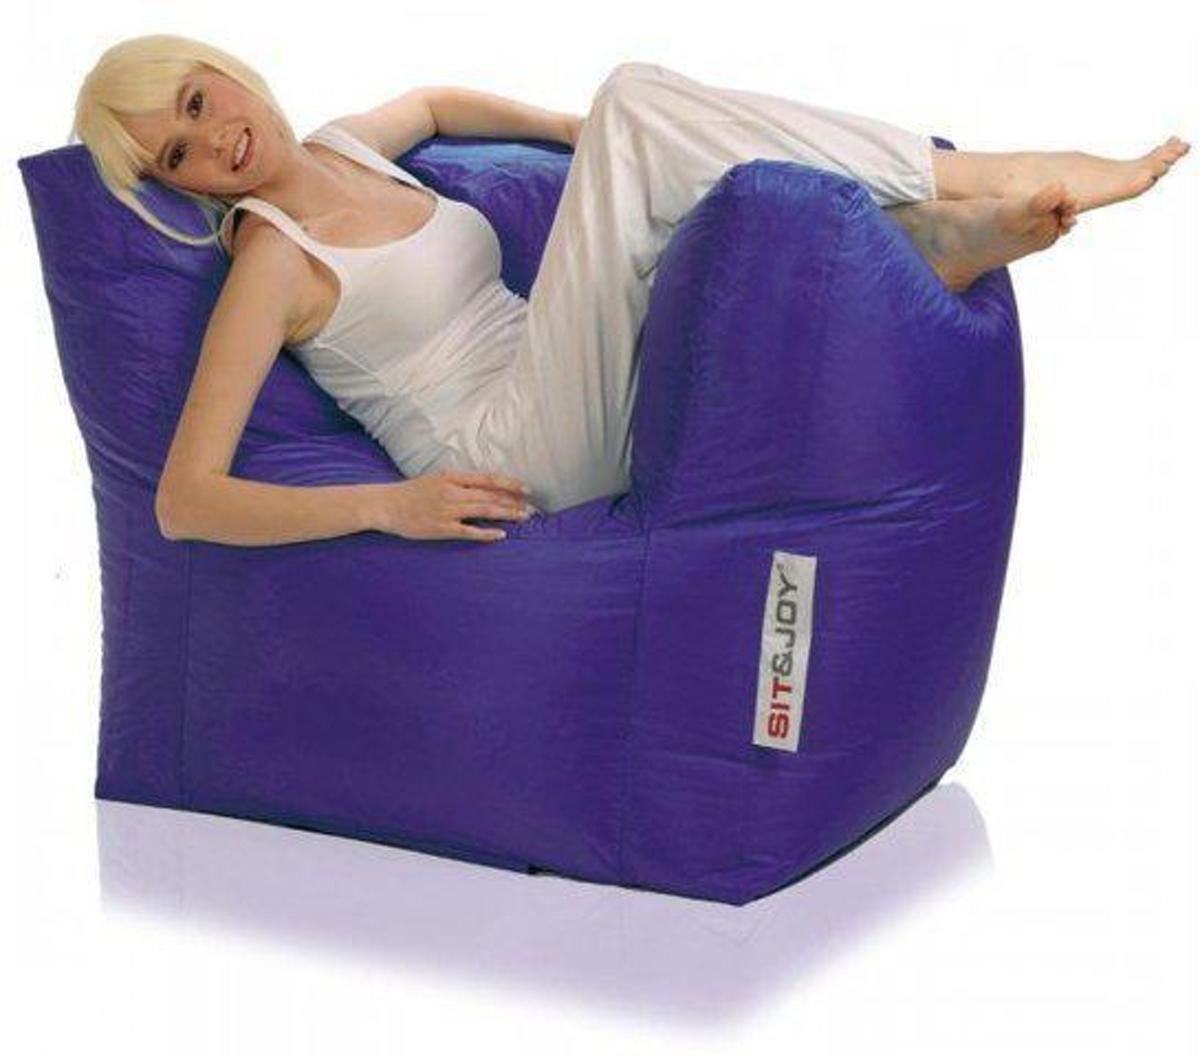 Sit En Joy Lounge Zitzak.Sit And Joy Lounge Chair Zitzak Paars Vergelijk Lage Prijzen